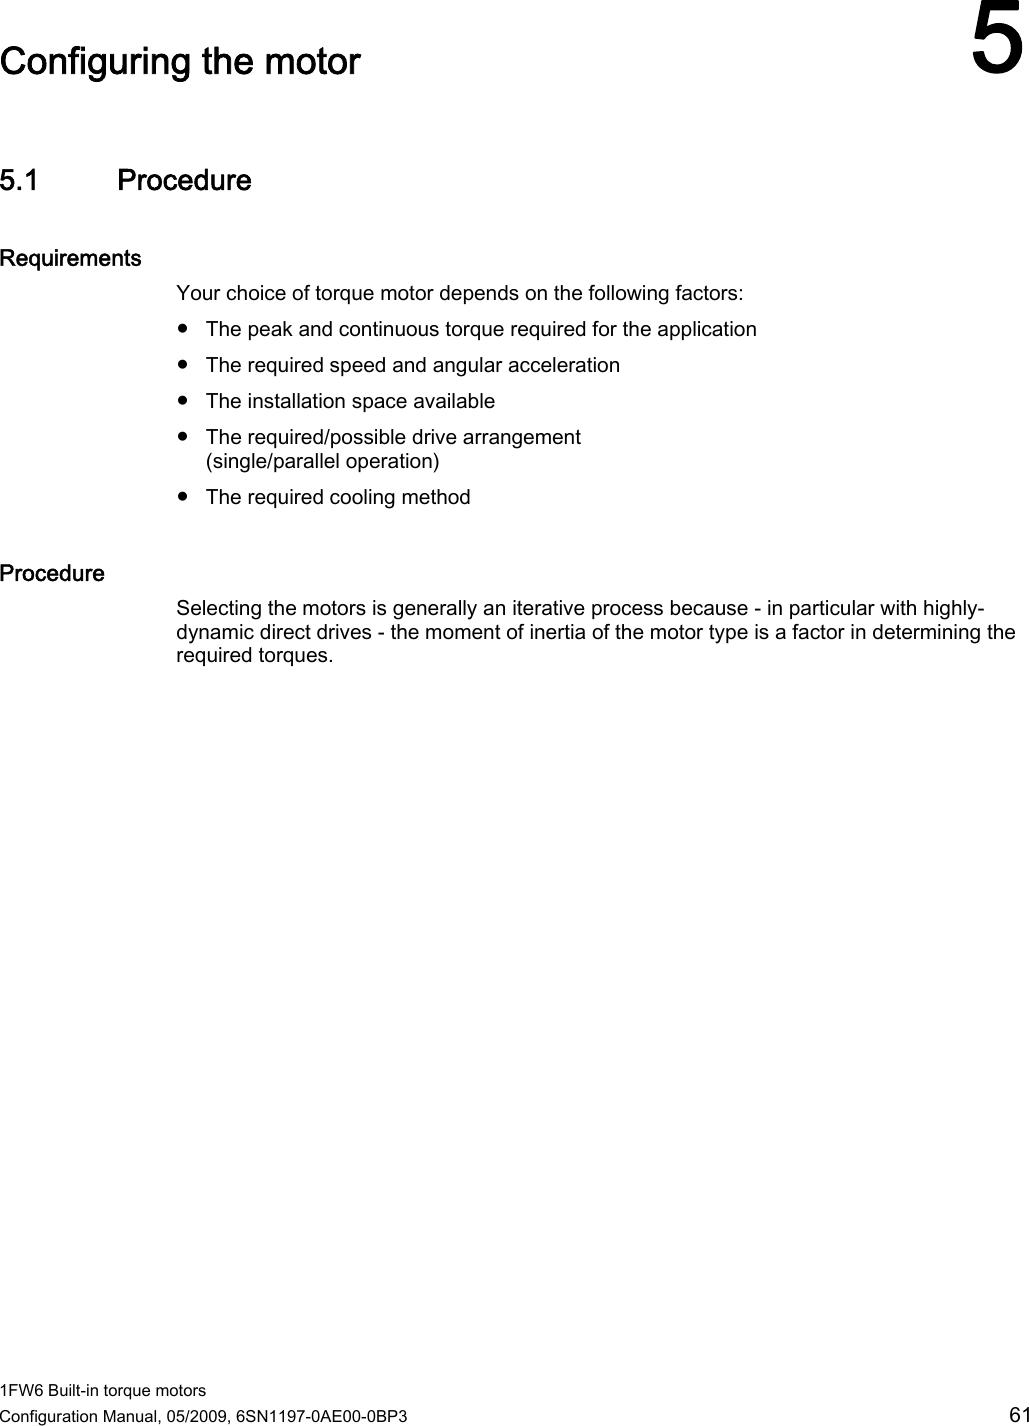 Siemens Outboard Motor S120 Users Manual